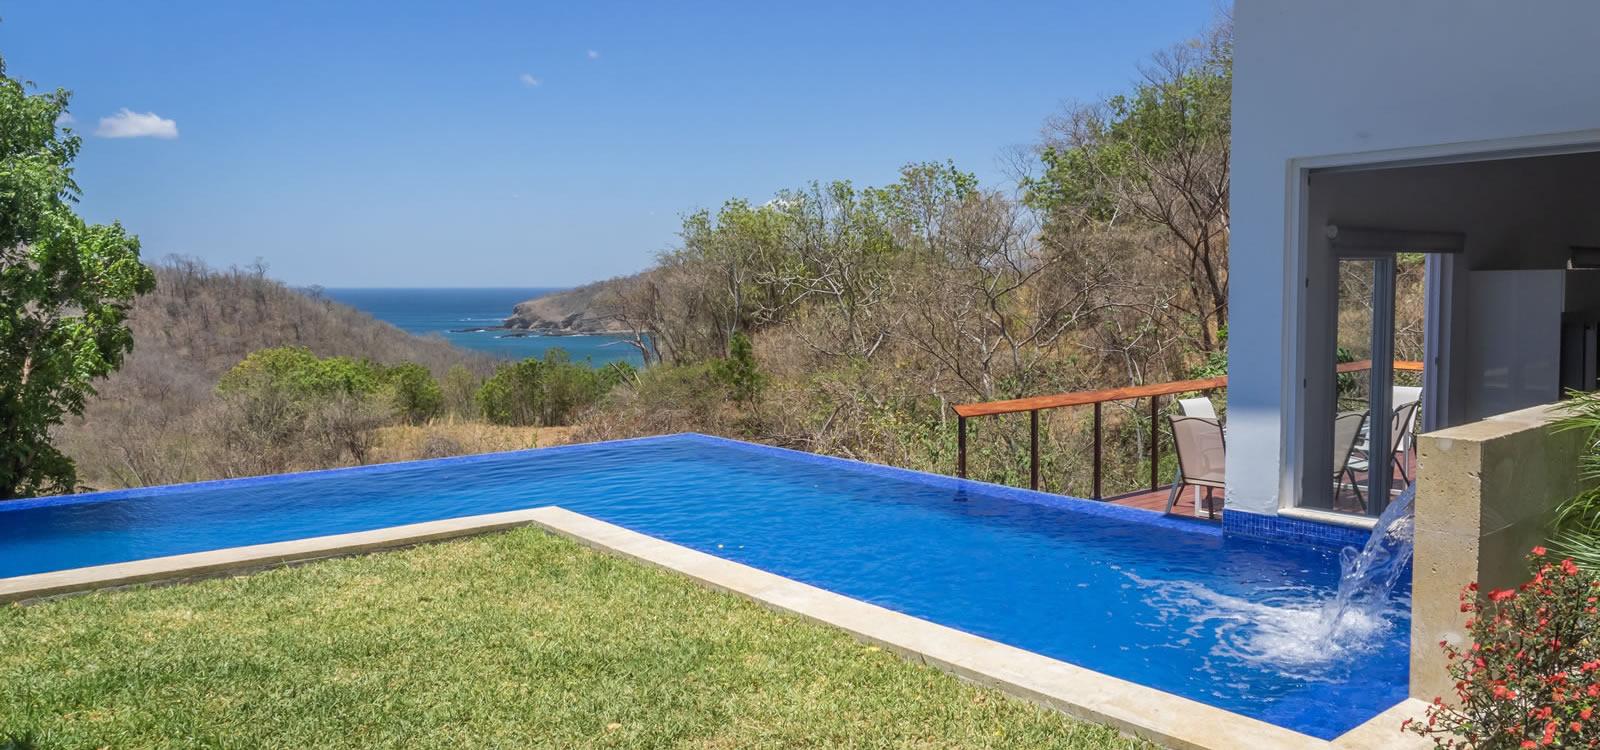 5 Bedroom Home For Sale Pacific Marlin San Juan Del Sur Nicaragua 7th Heaven Properties